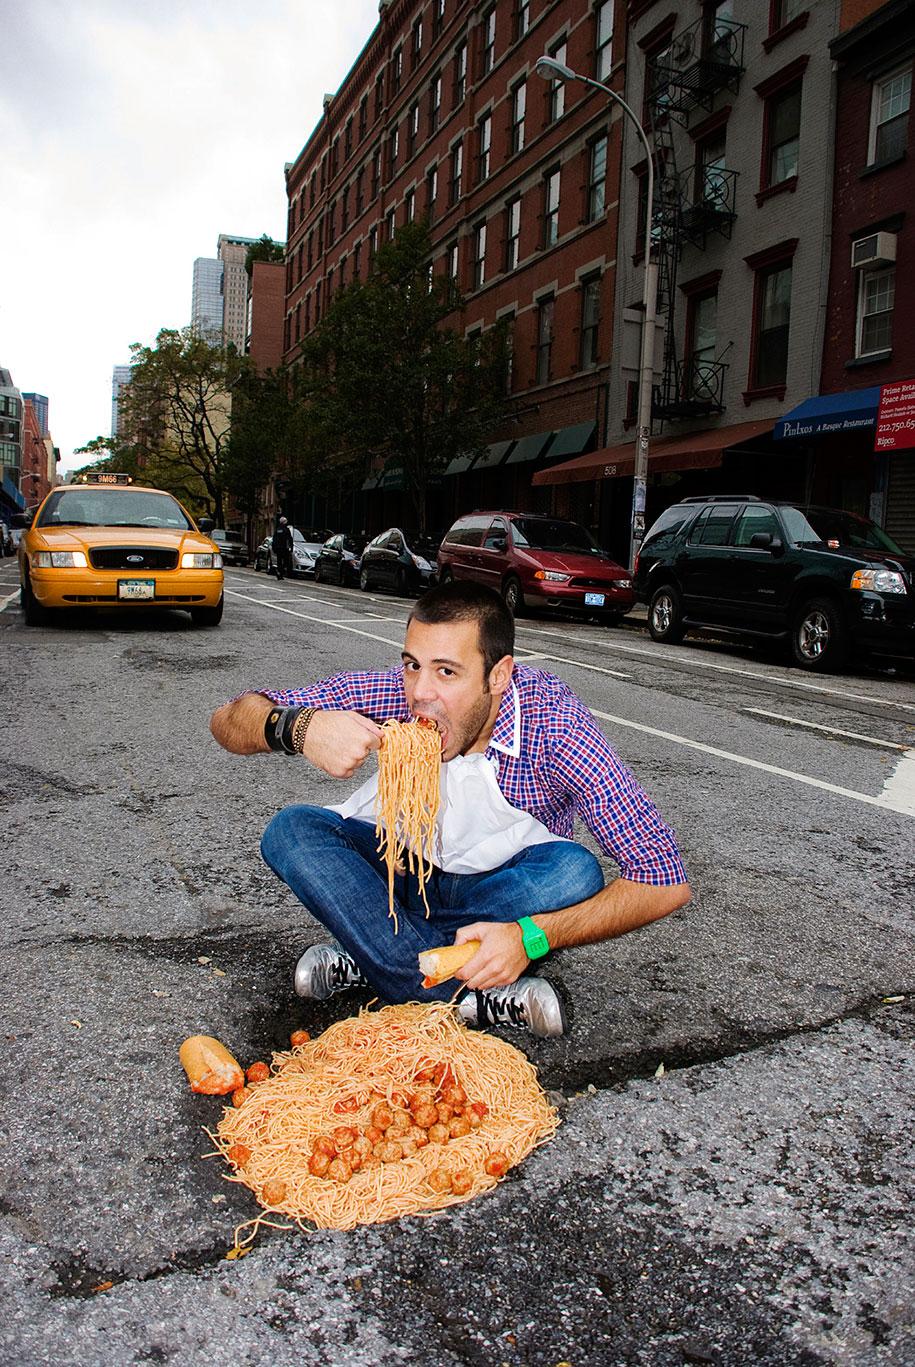 Ingenious And Surreal Photograph Series Against City Potholes Vuing Com